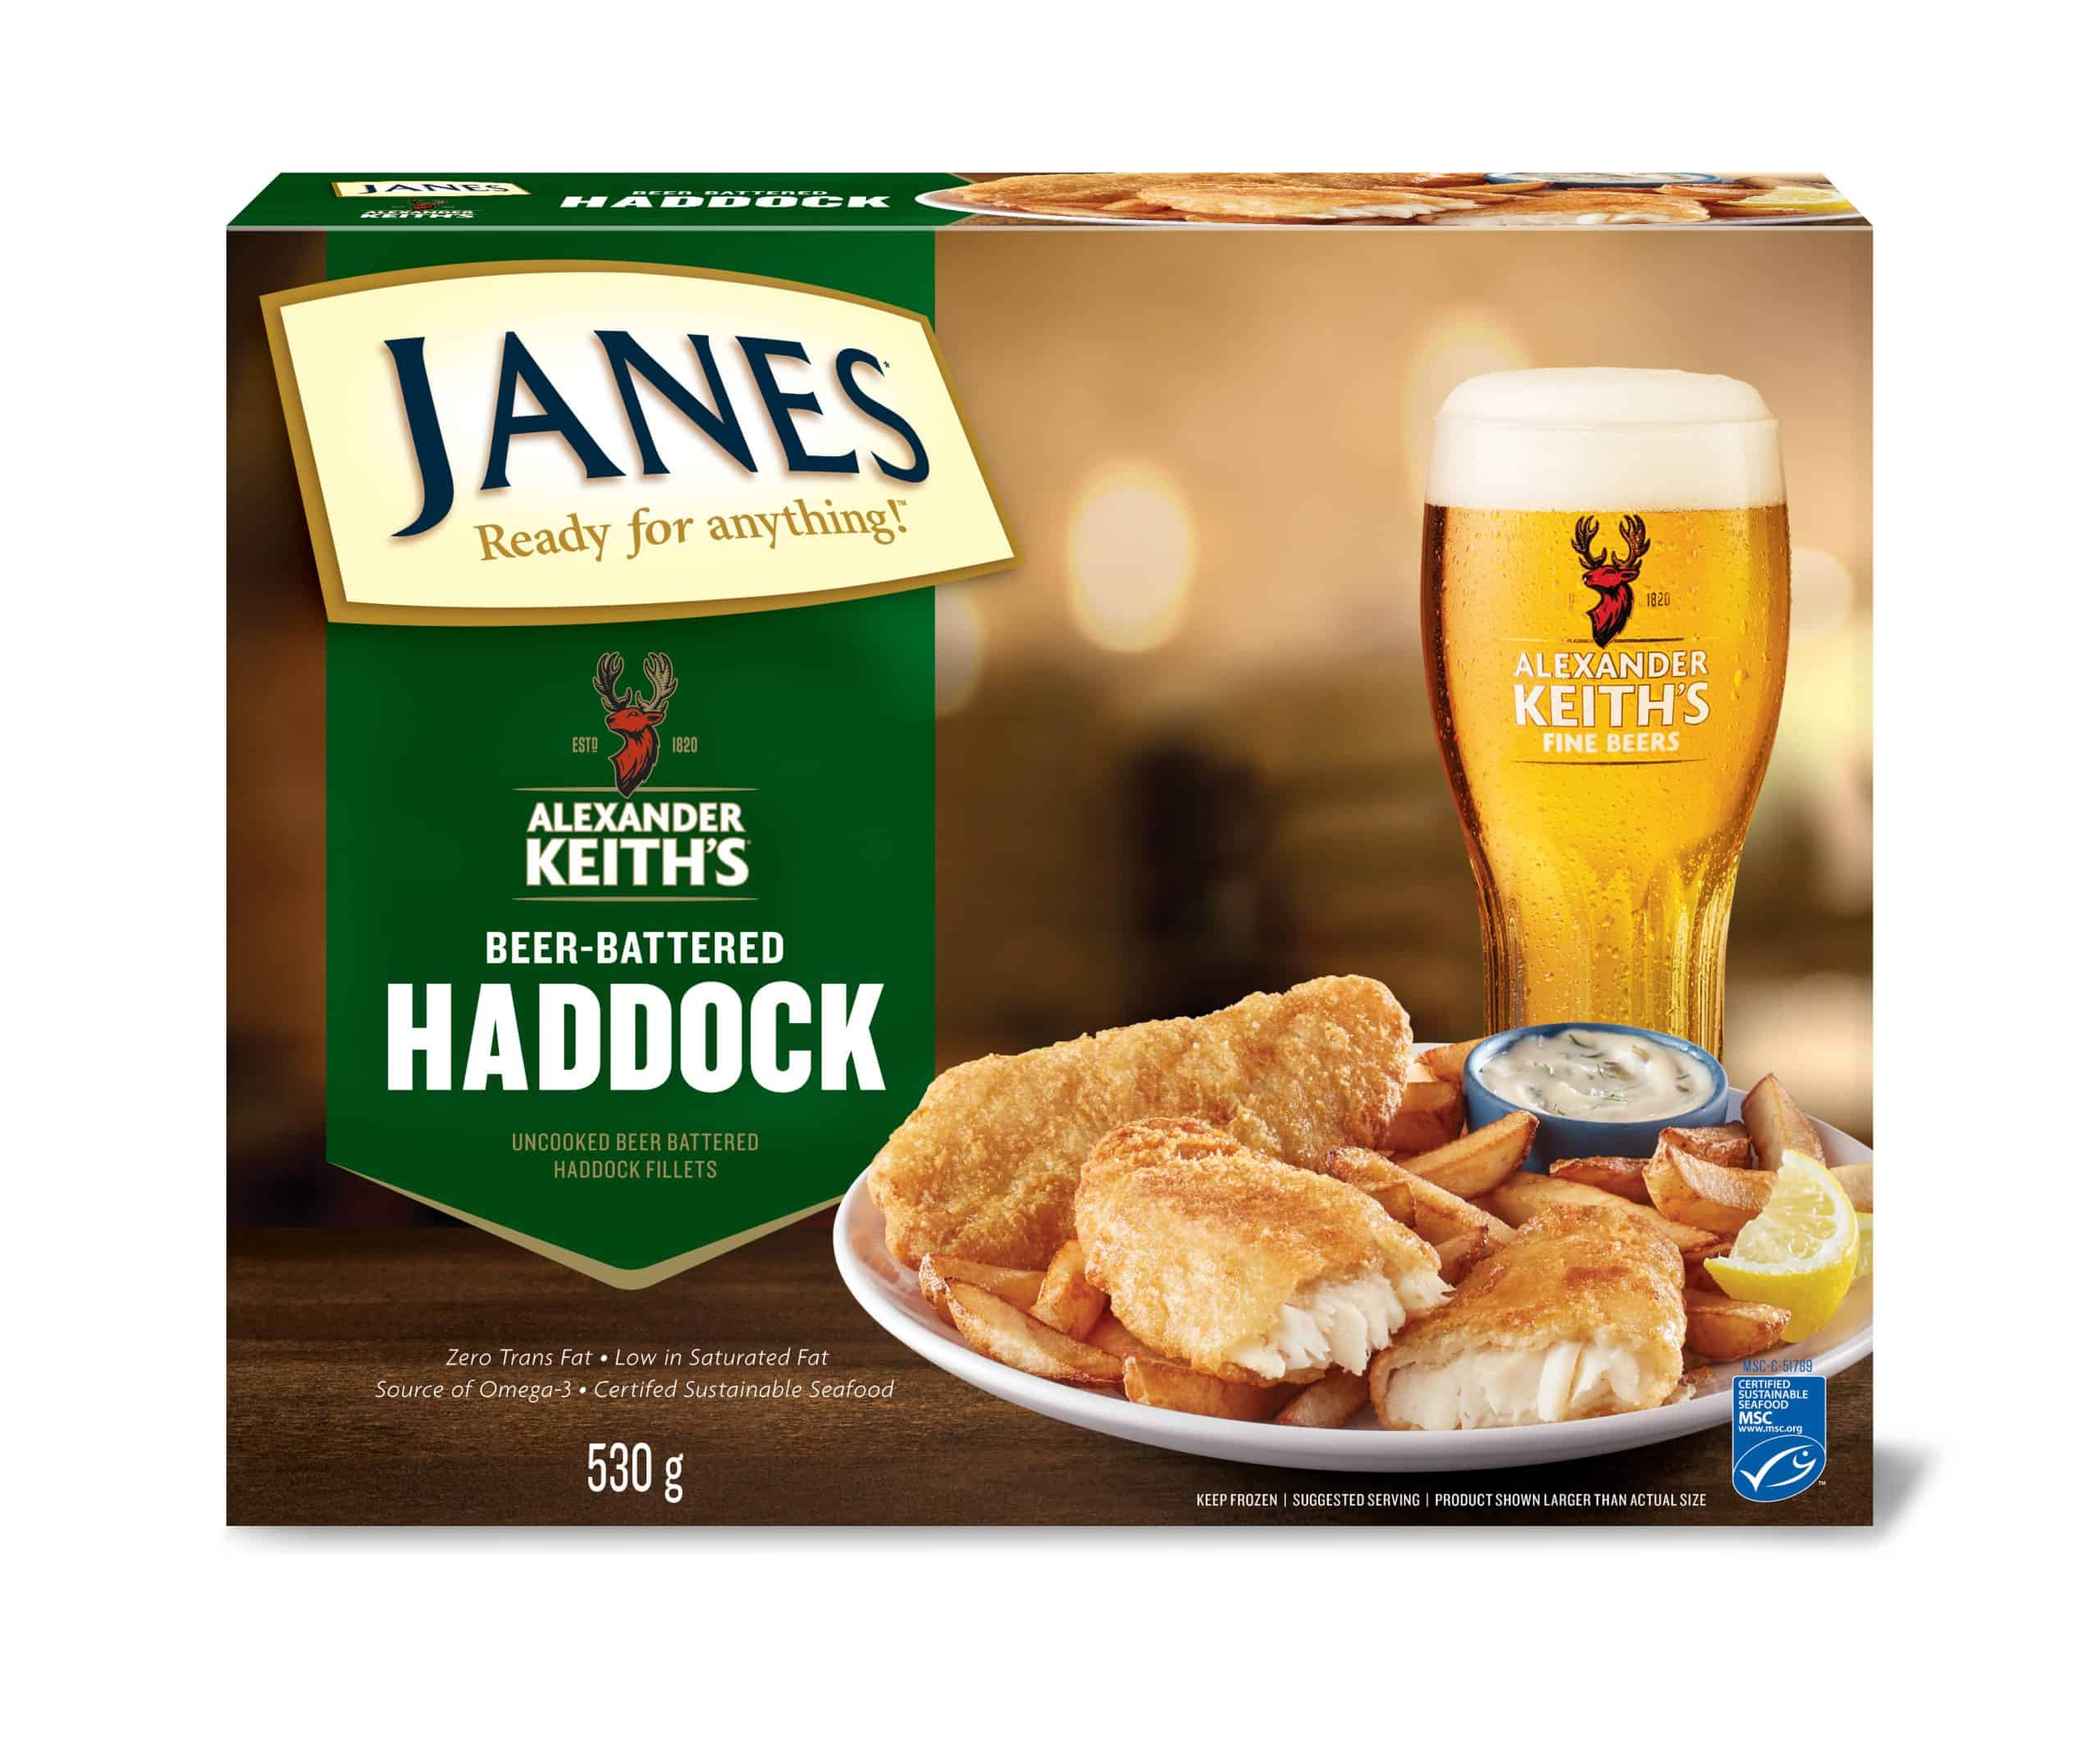 Alexander Keith's Beer-Battered Haddock Fillets